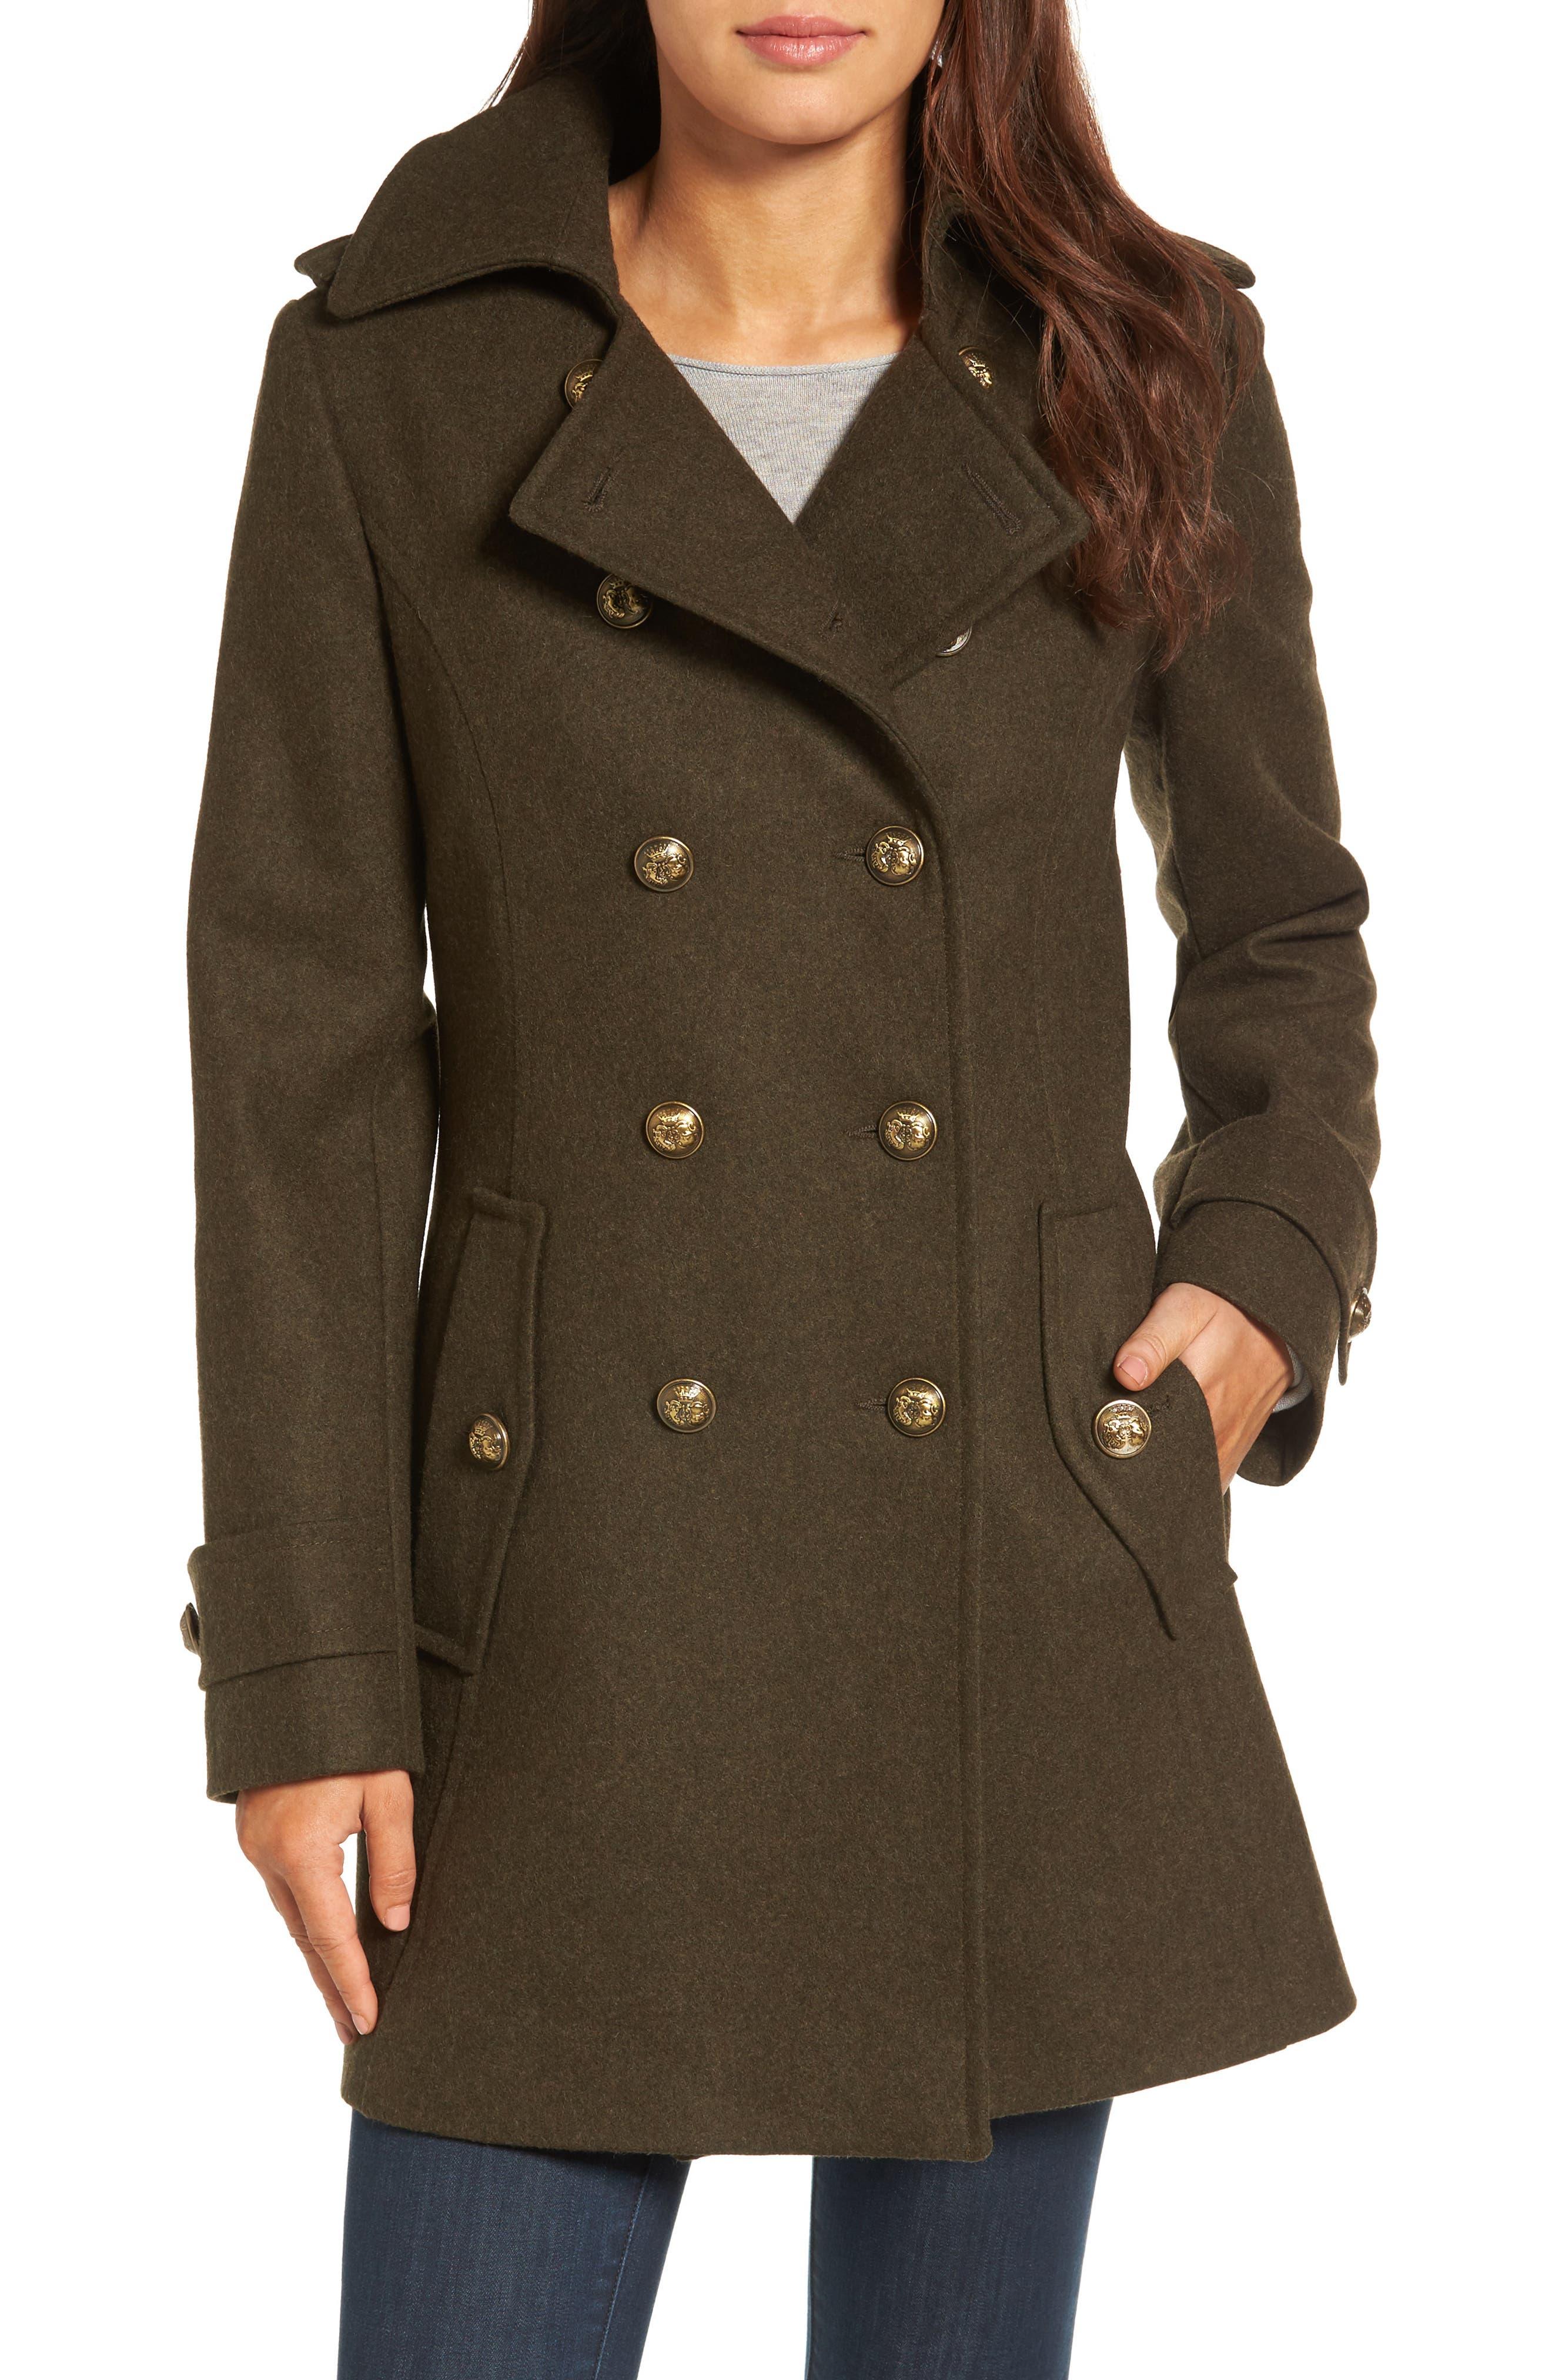 Main Image - London Fog Wool Blend Skirted Military Coat